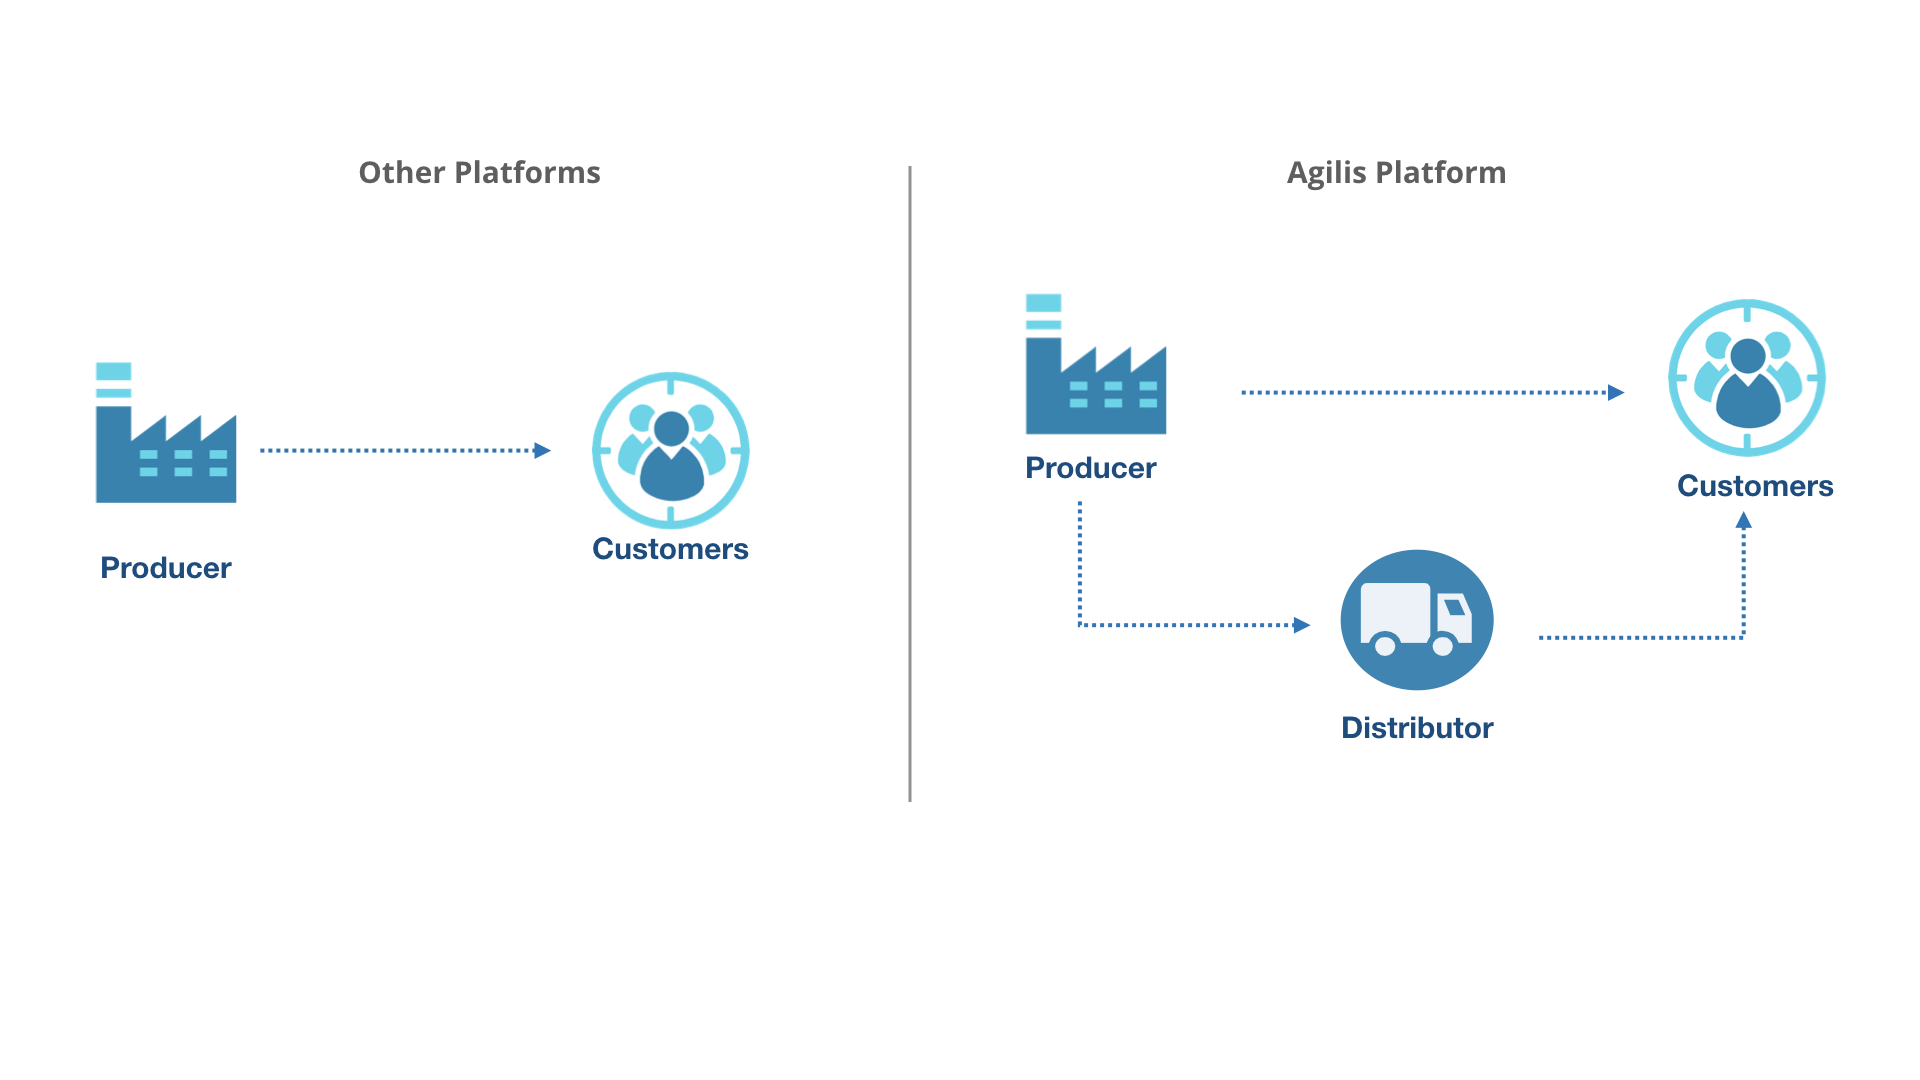 Agilis: A Commerce Platform that solves producers' dilemma